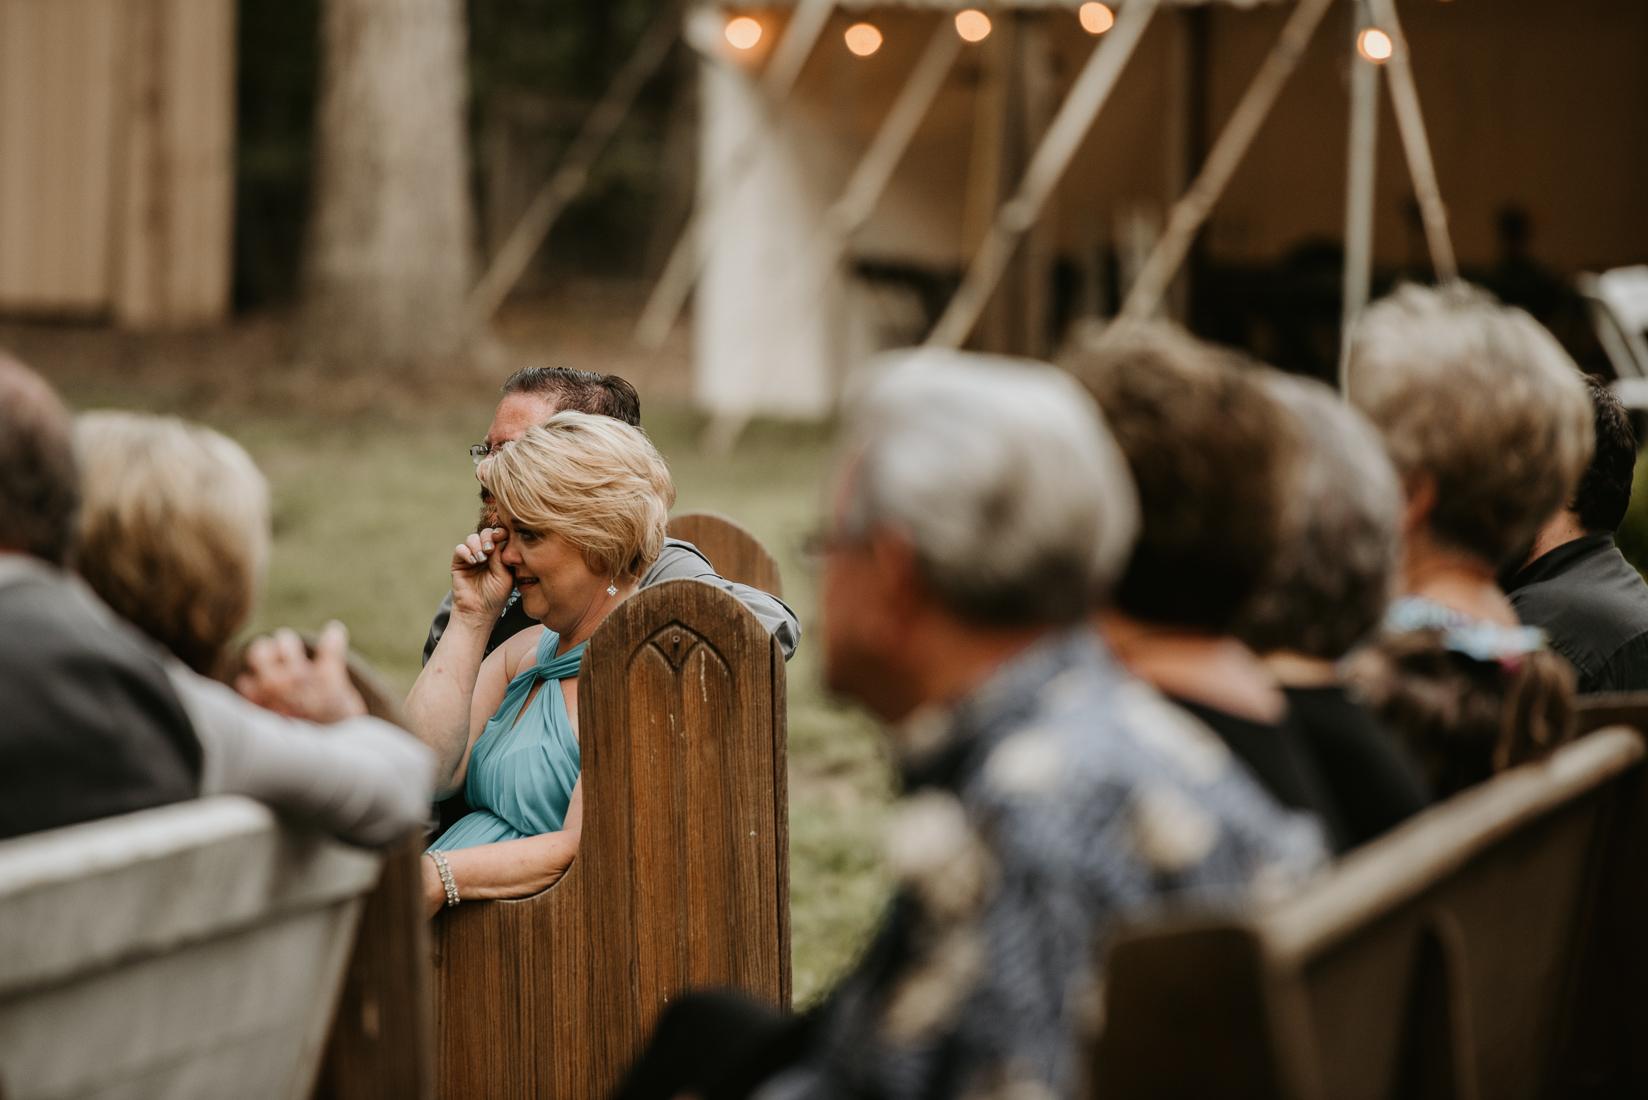 olivia_zay_wedding_09_2018-7659.jpg